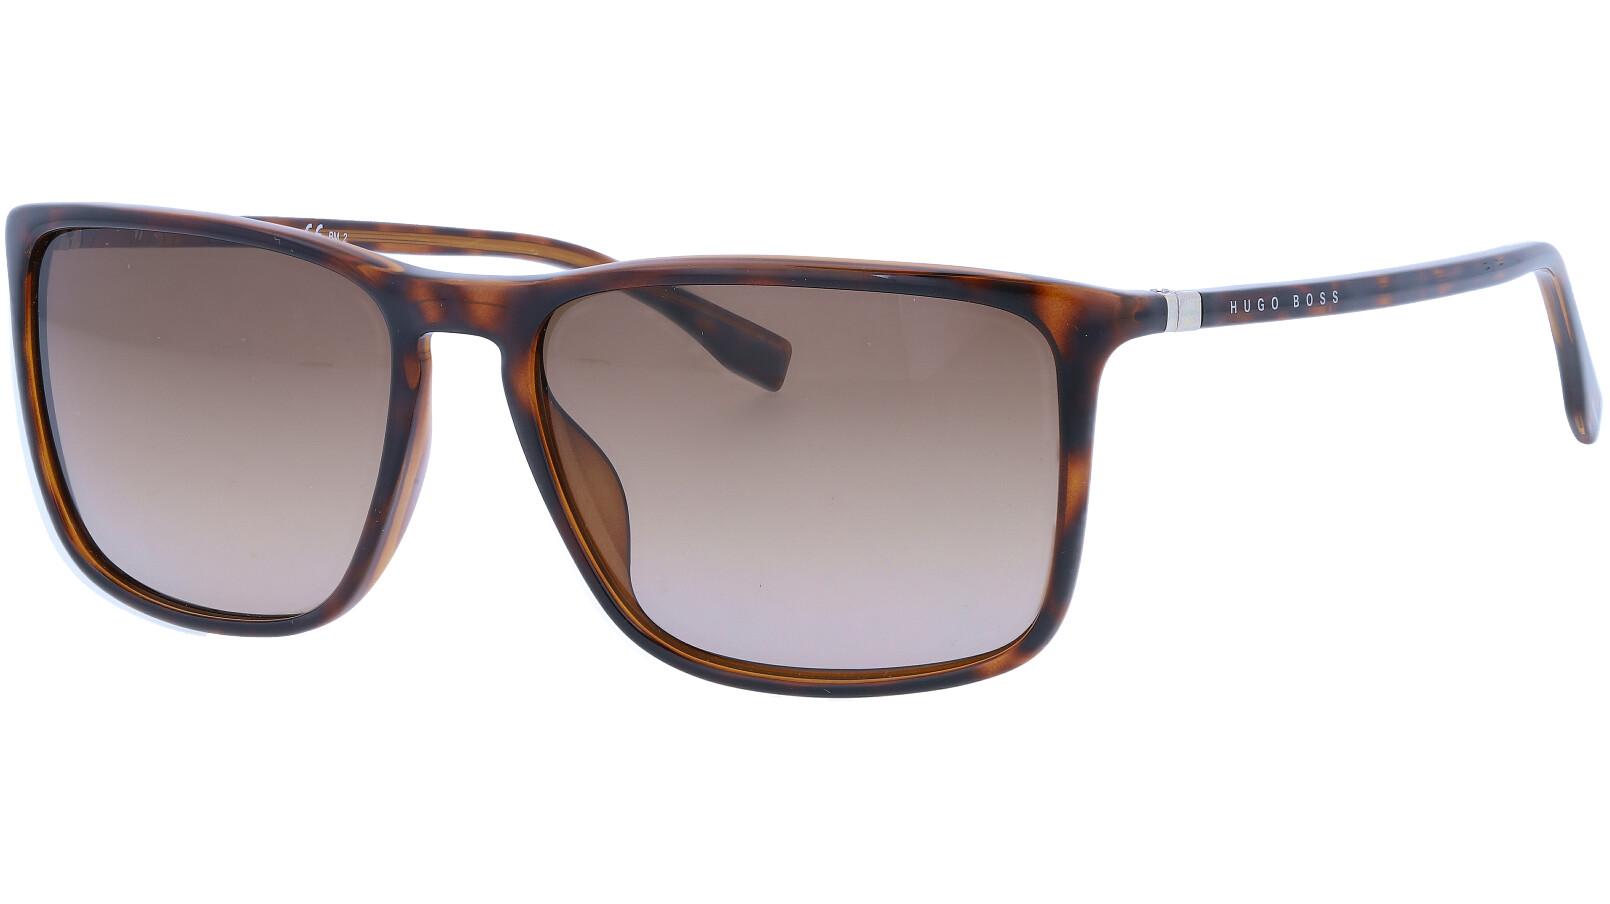 Hugo Boss BOSS0665S DWJHA 57 Havana Sunglasses